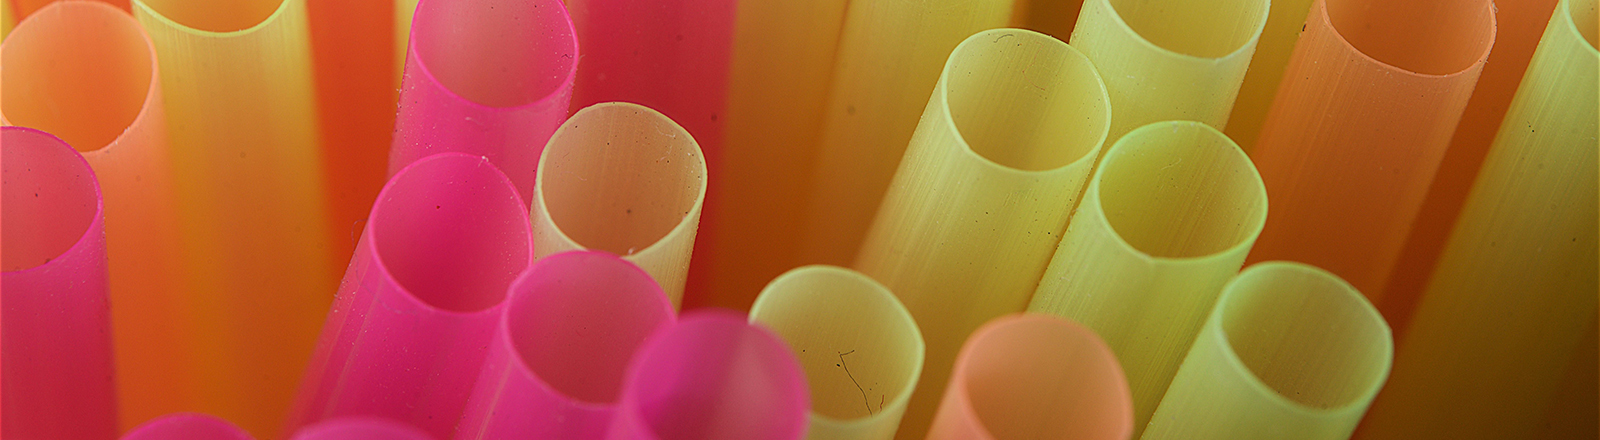 Trinkhalme aus Plastik